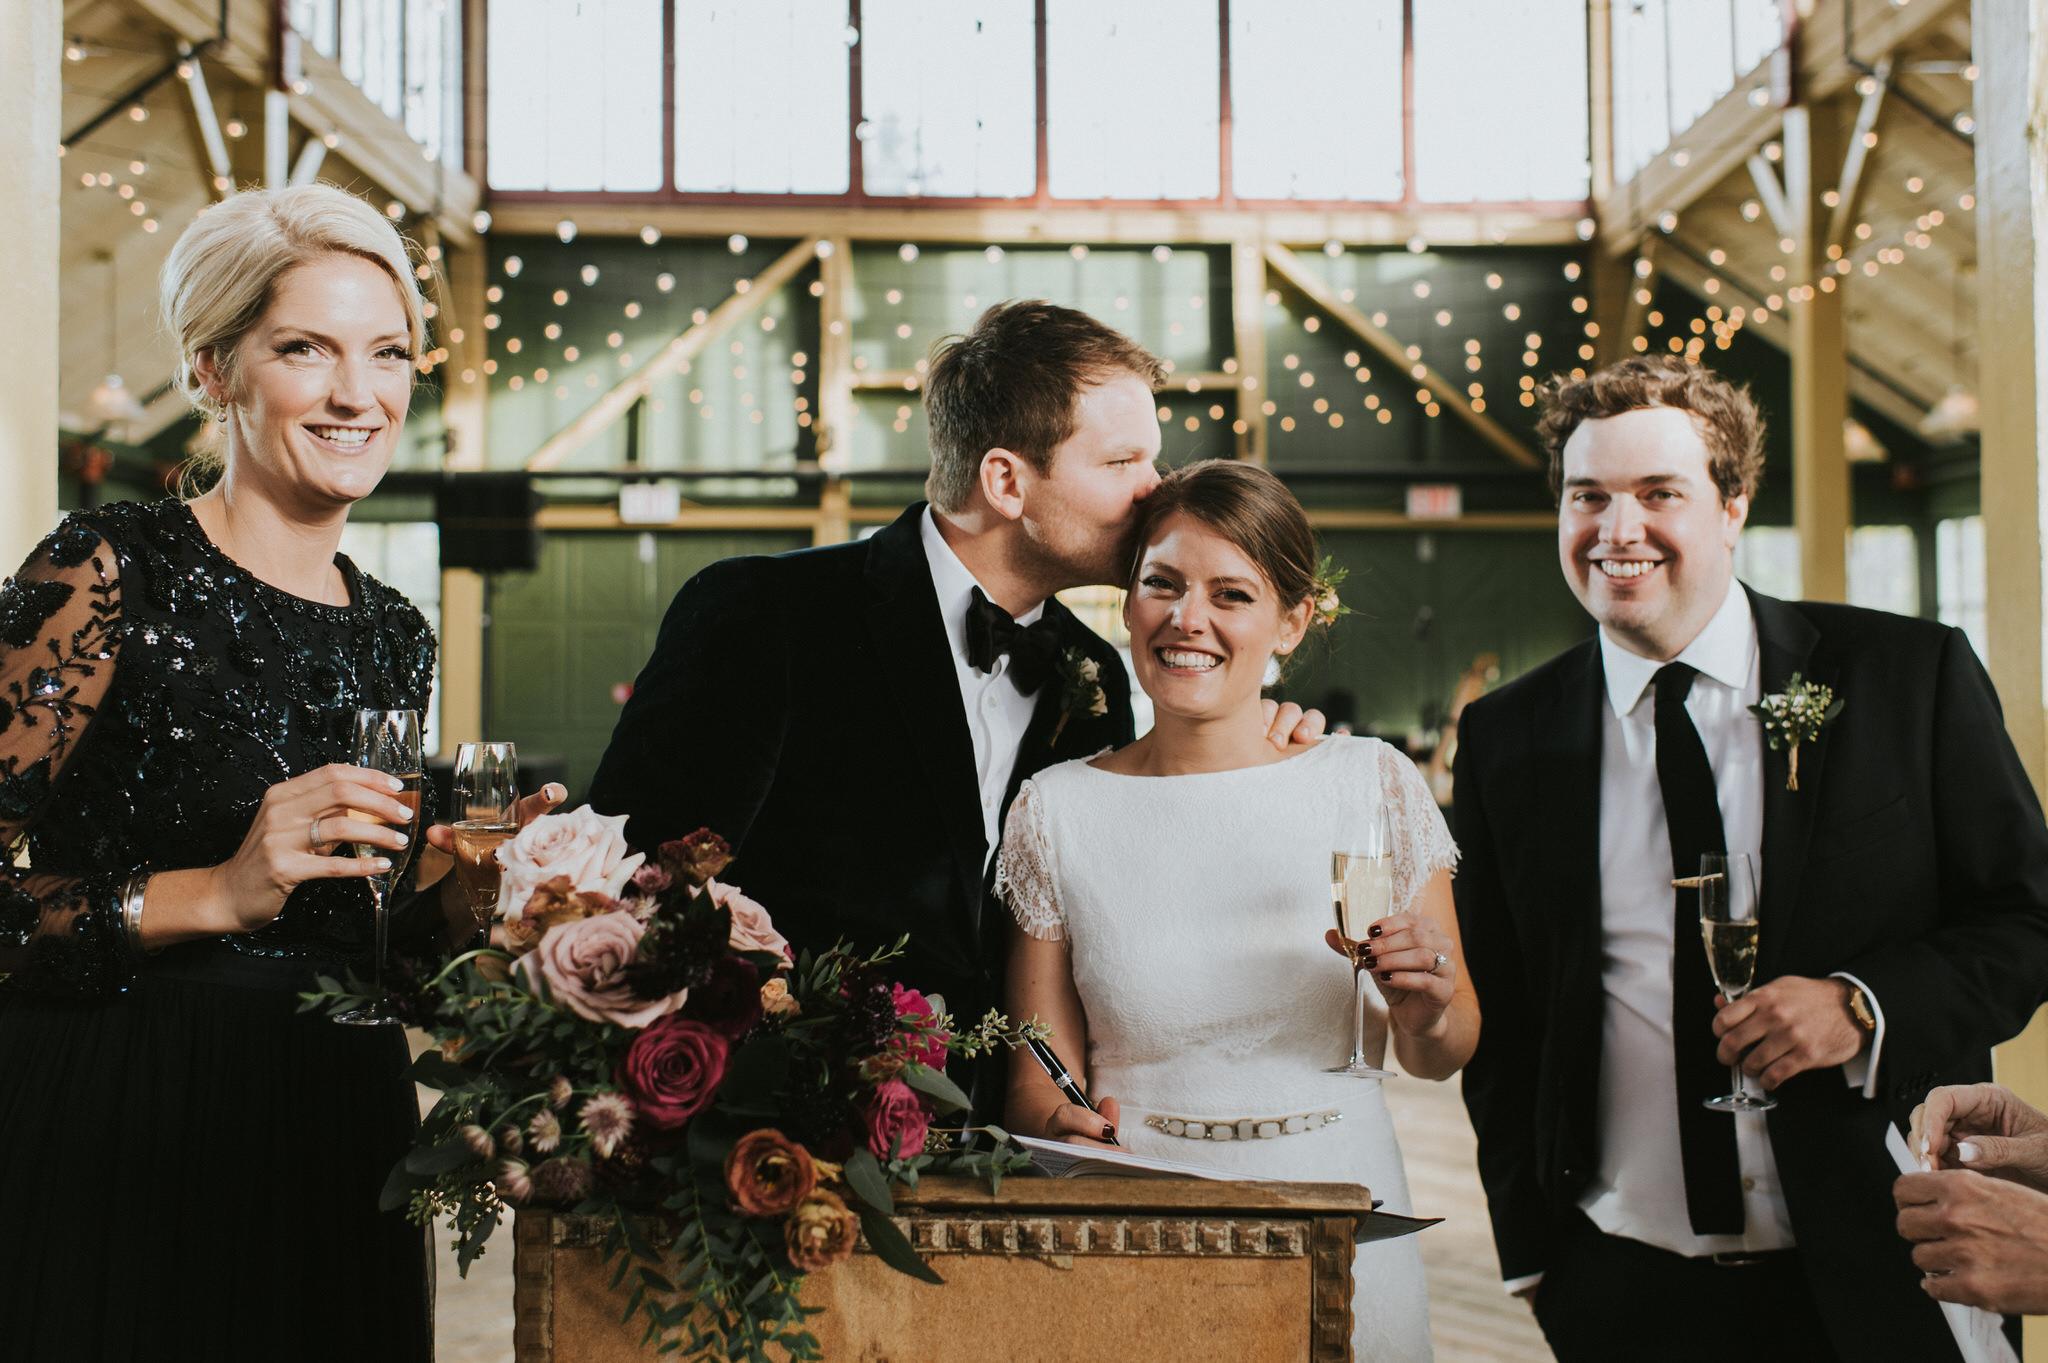 scarletoneillphotography_weddingphotography_prince edward county weddings126.JPG